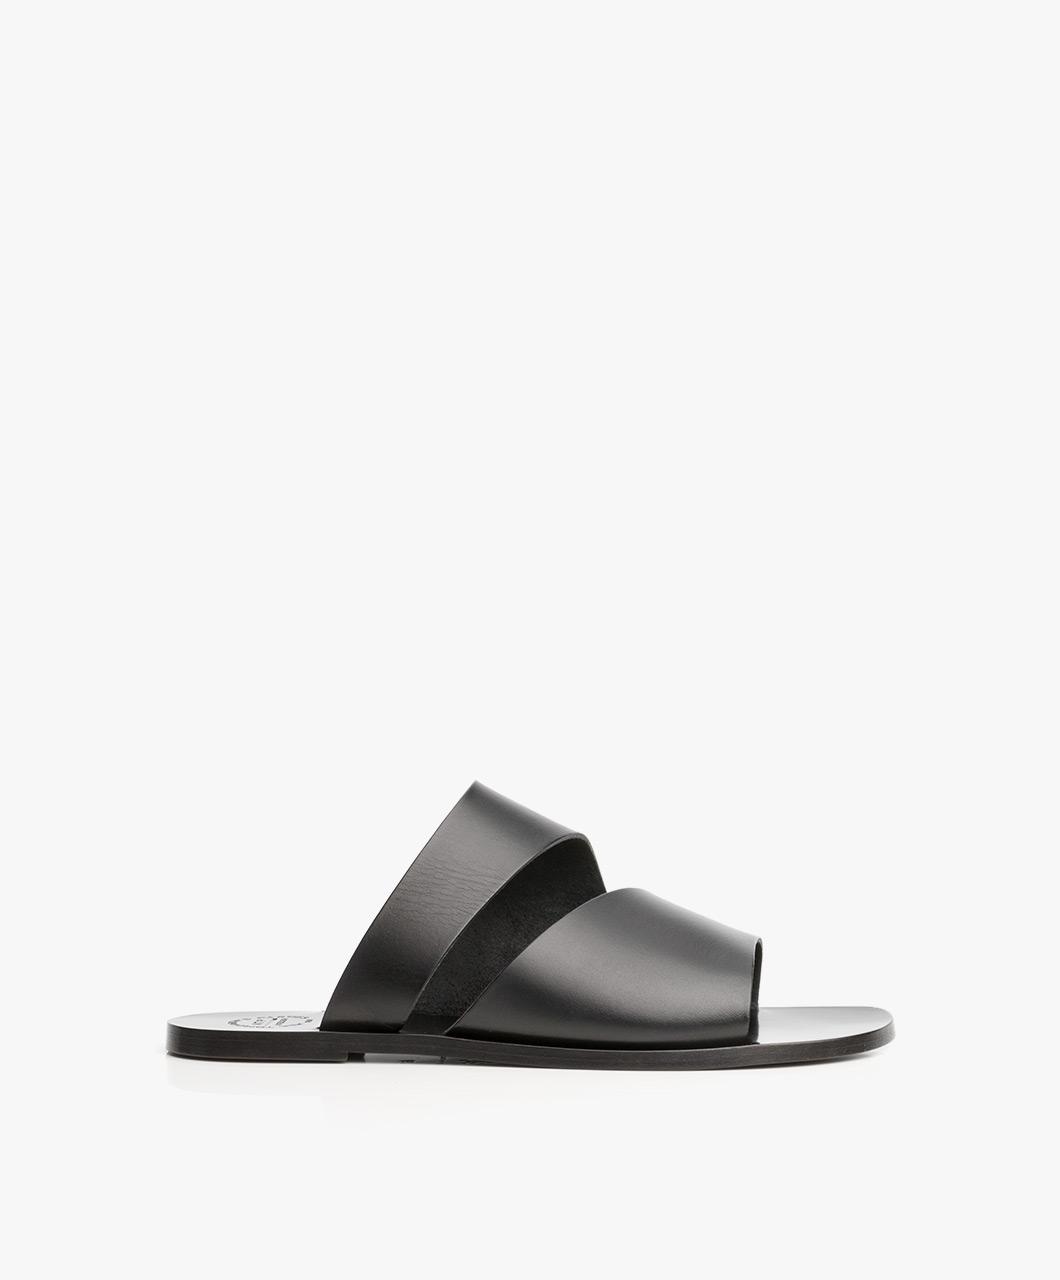 Immagine di ATP Atelier Slipper Sandals Lis in Black Leather